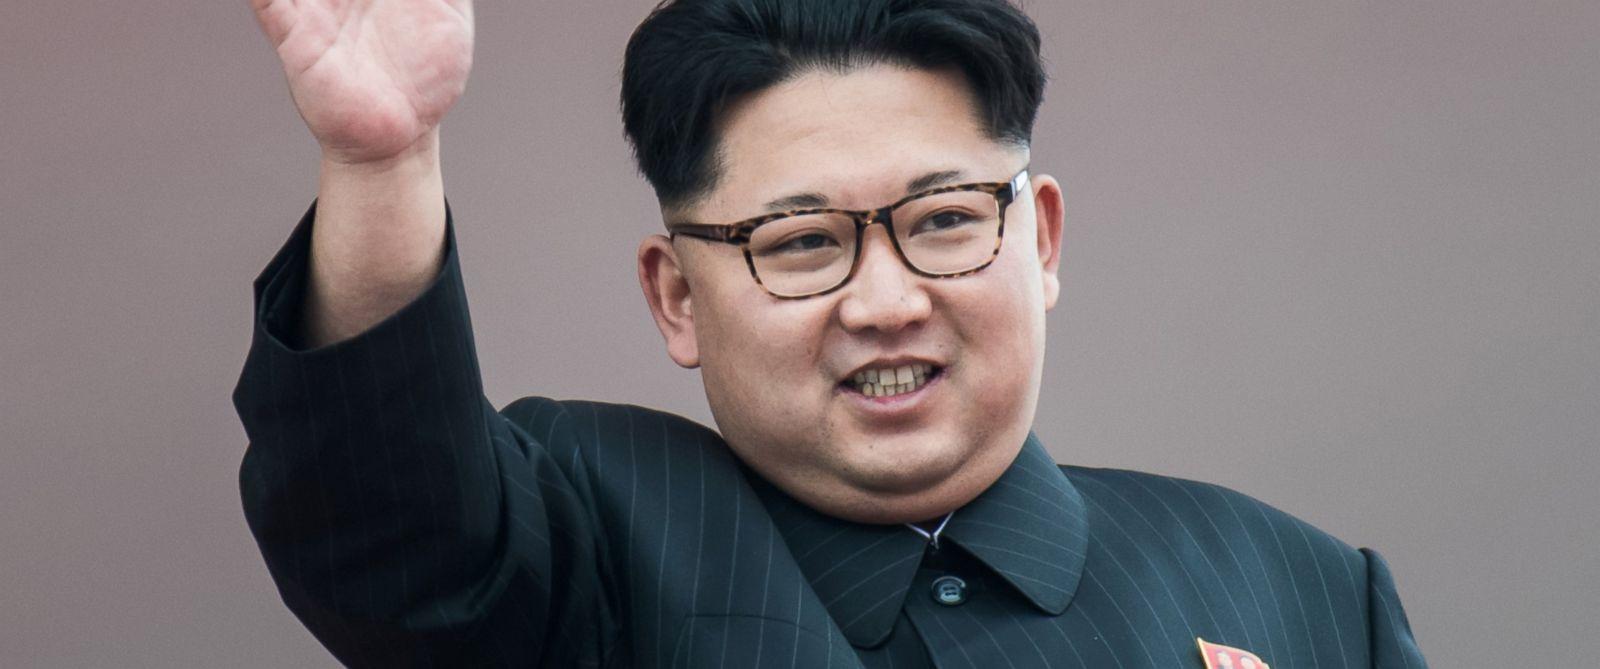 Image result for North Korea LEADER PHOTO